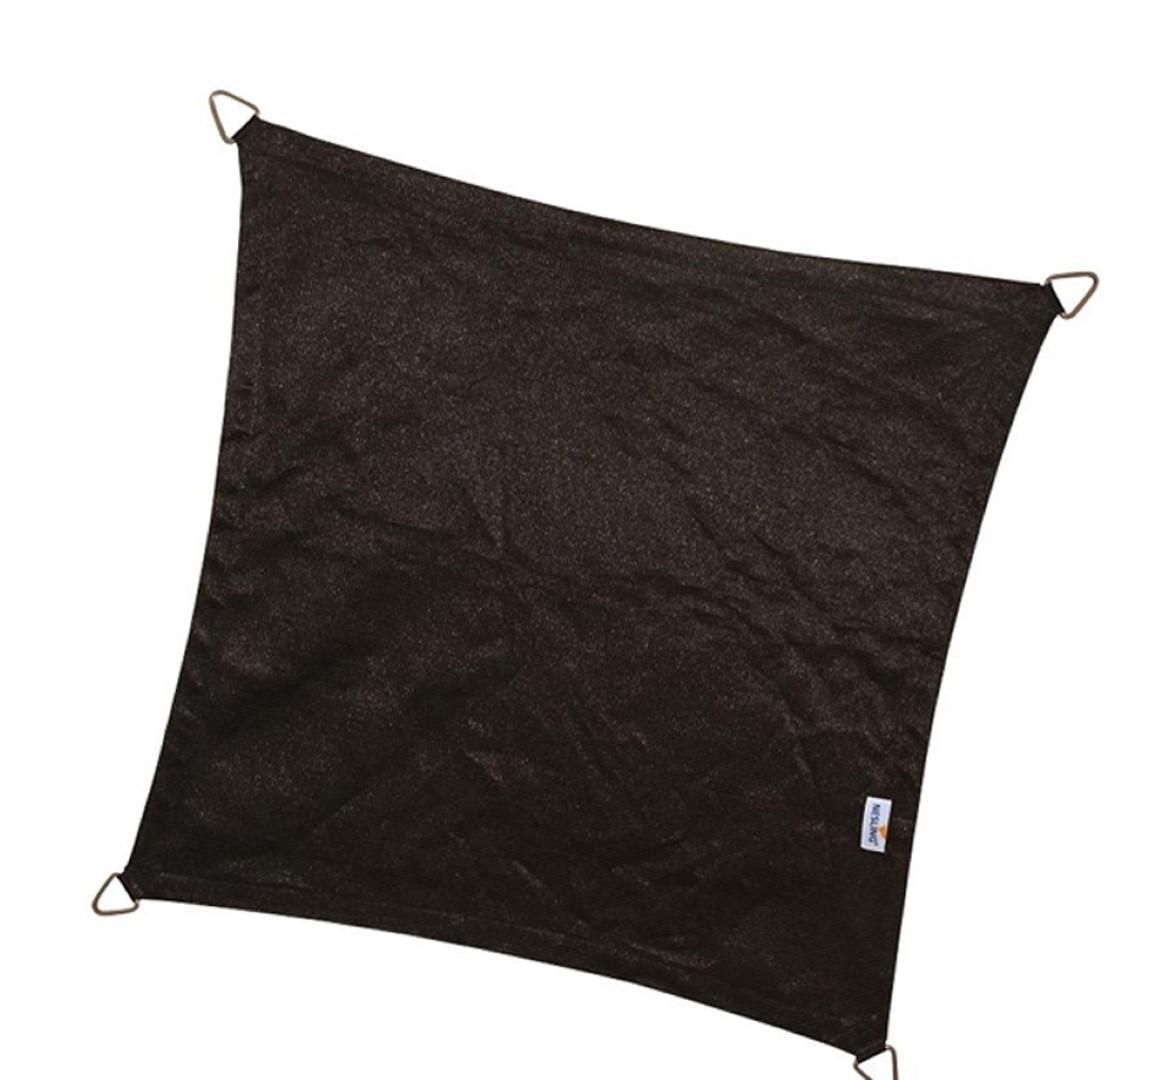 Vierkant 5,0 x 5,0 x 5,0 x 5,0m, Zwart